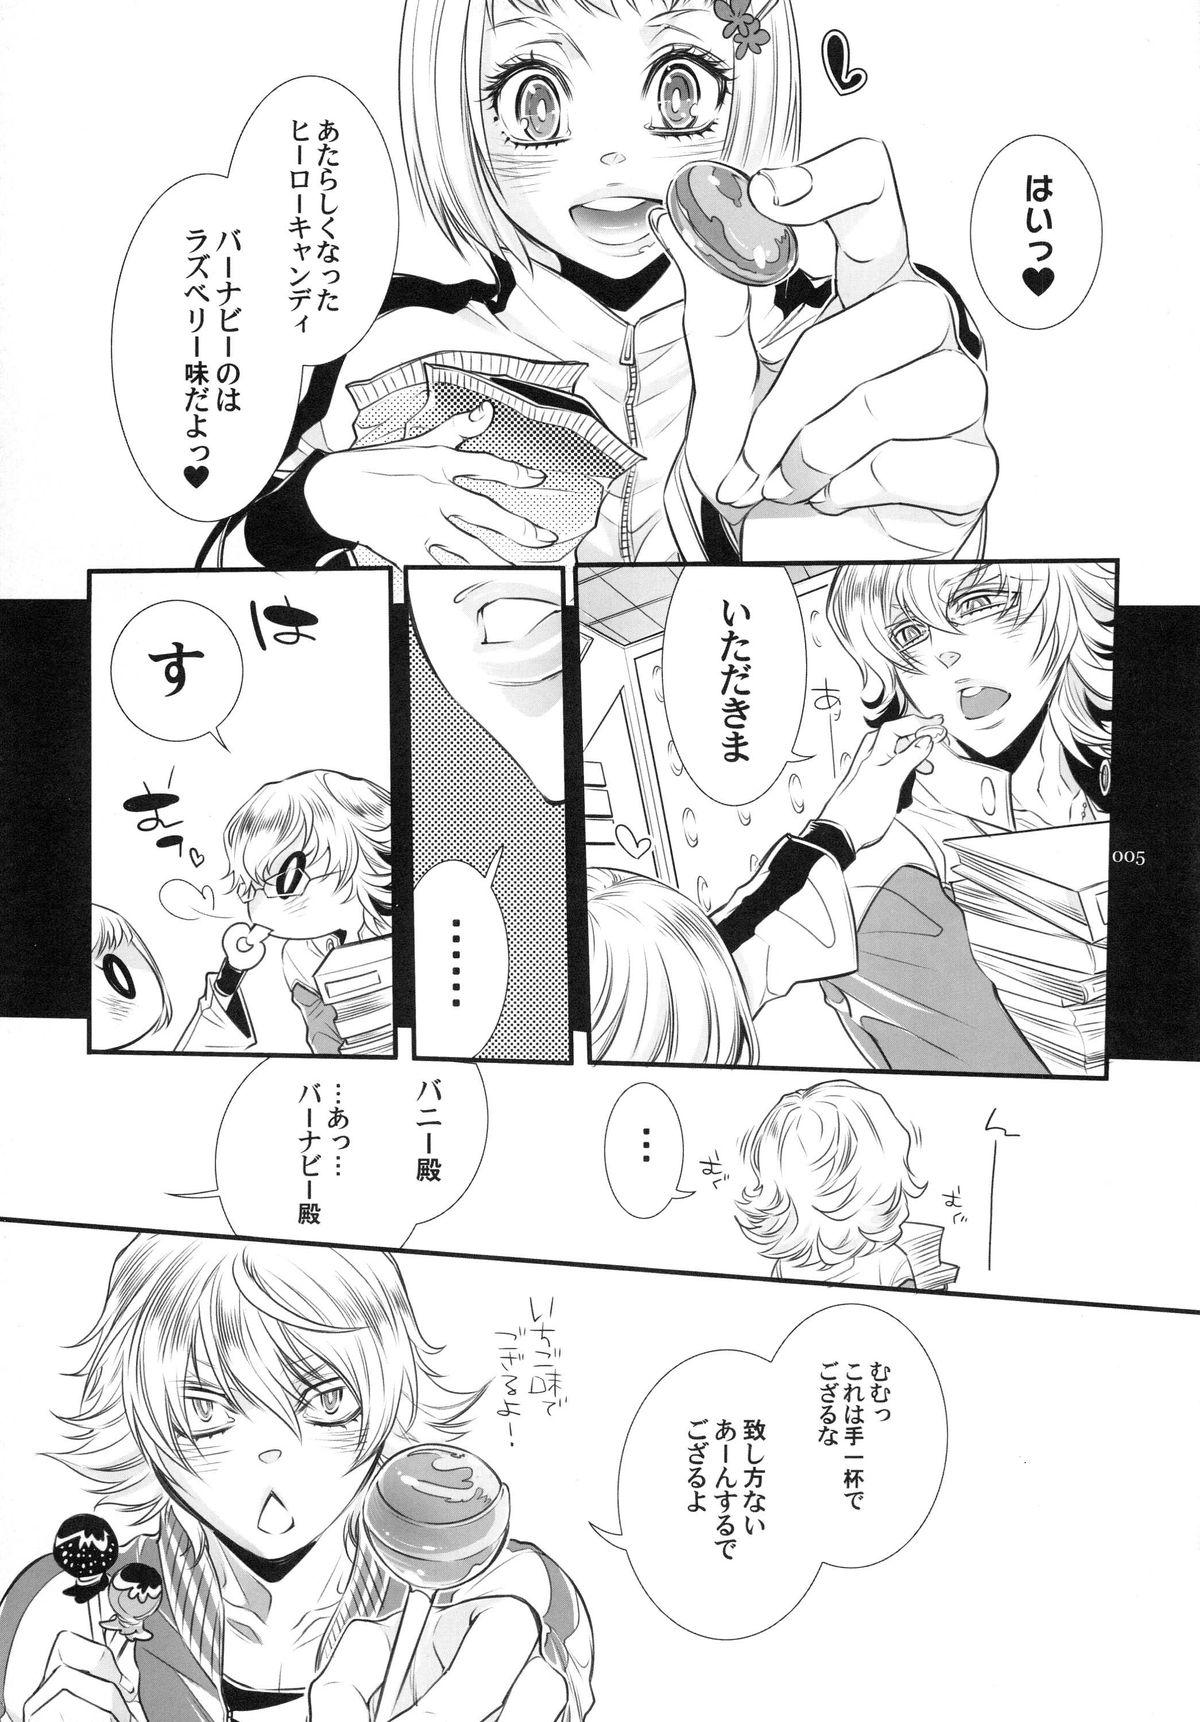 Bunny-chan to Iikoto Shiyokka 4